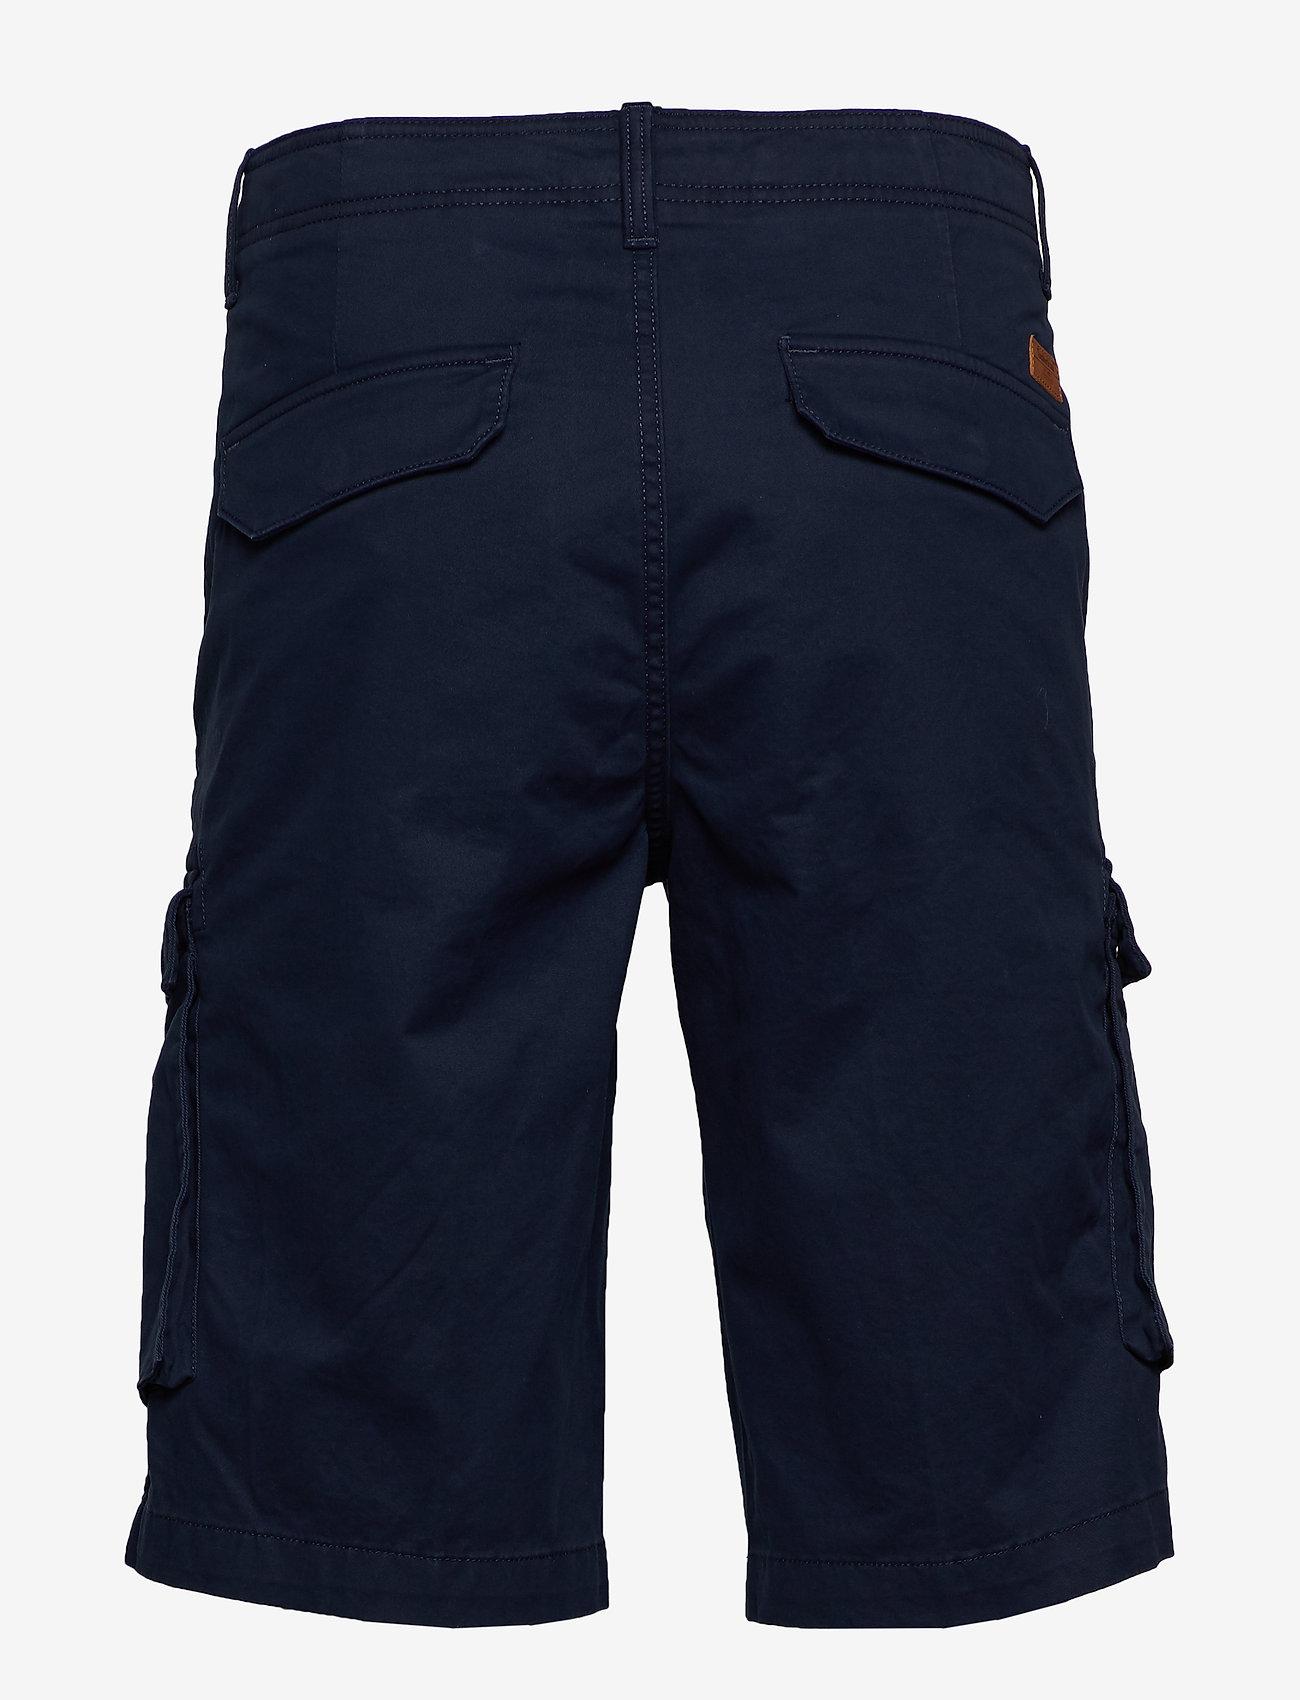 Timberland - T-L Str Twll Crgo Shrt - cargo shorts - dark sapphire - 1